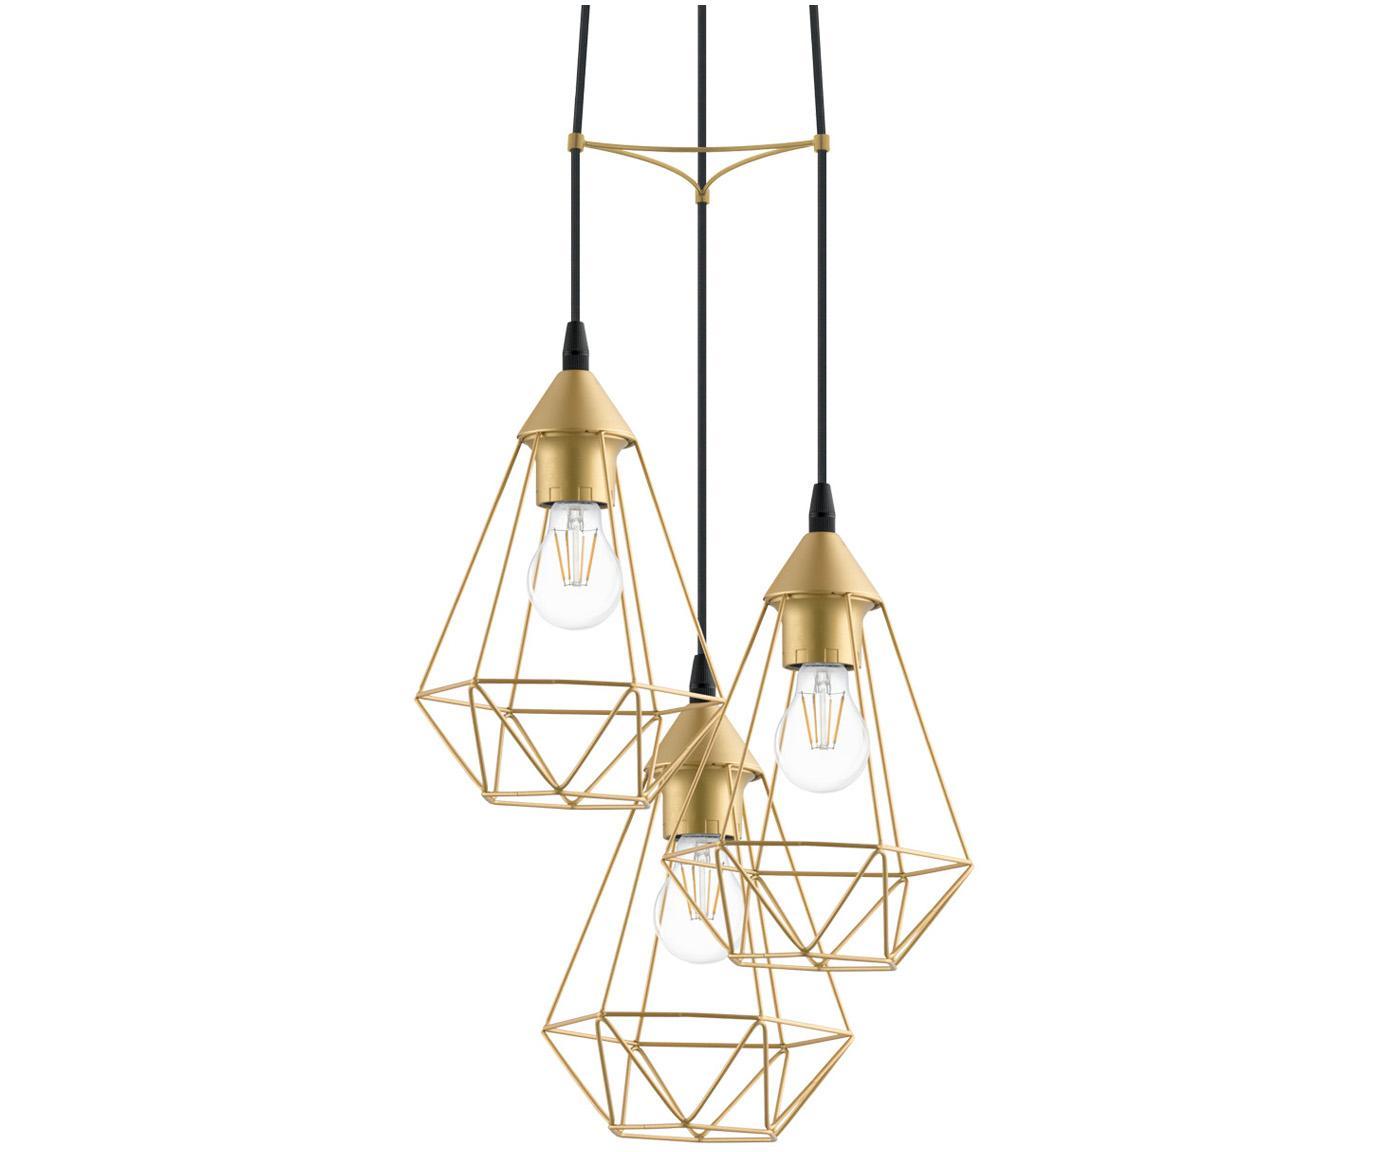 Hanglamp Kyle, Baldakijn: geborsteld metaal, Goudkleurig, Ø 36 cm